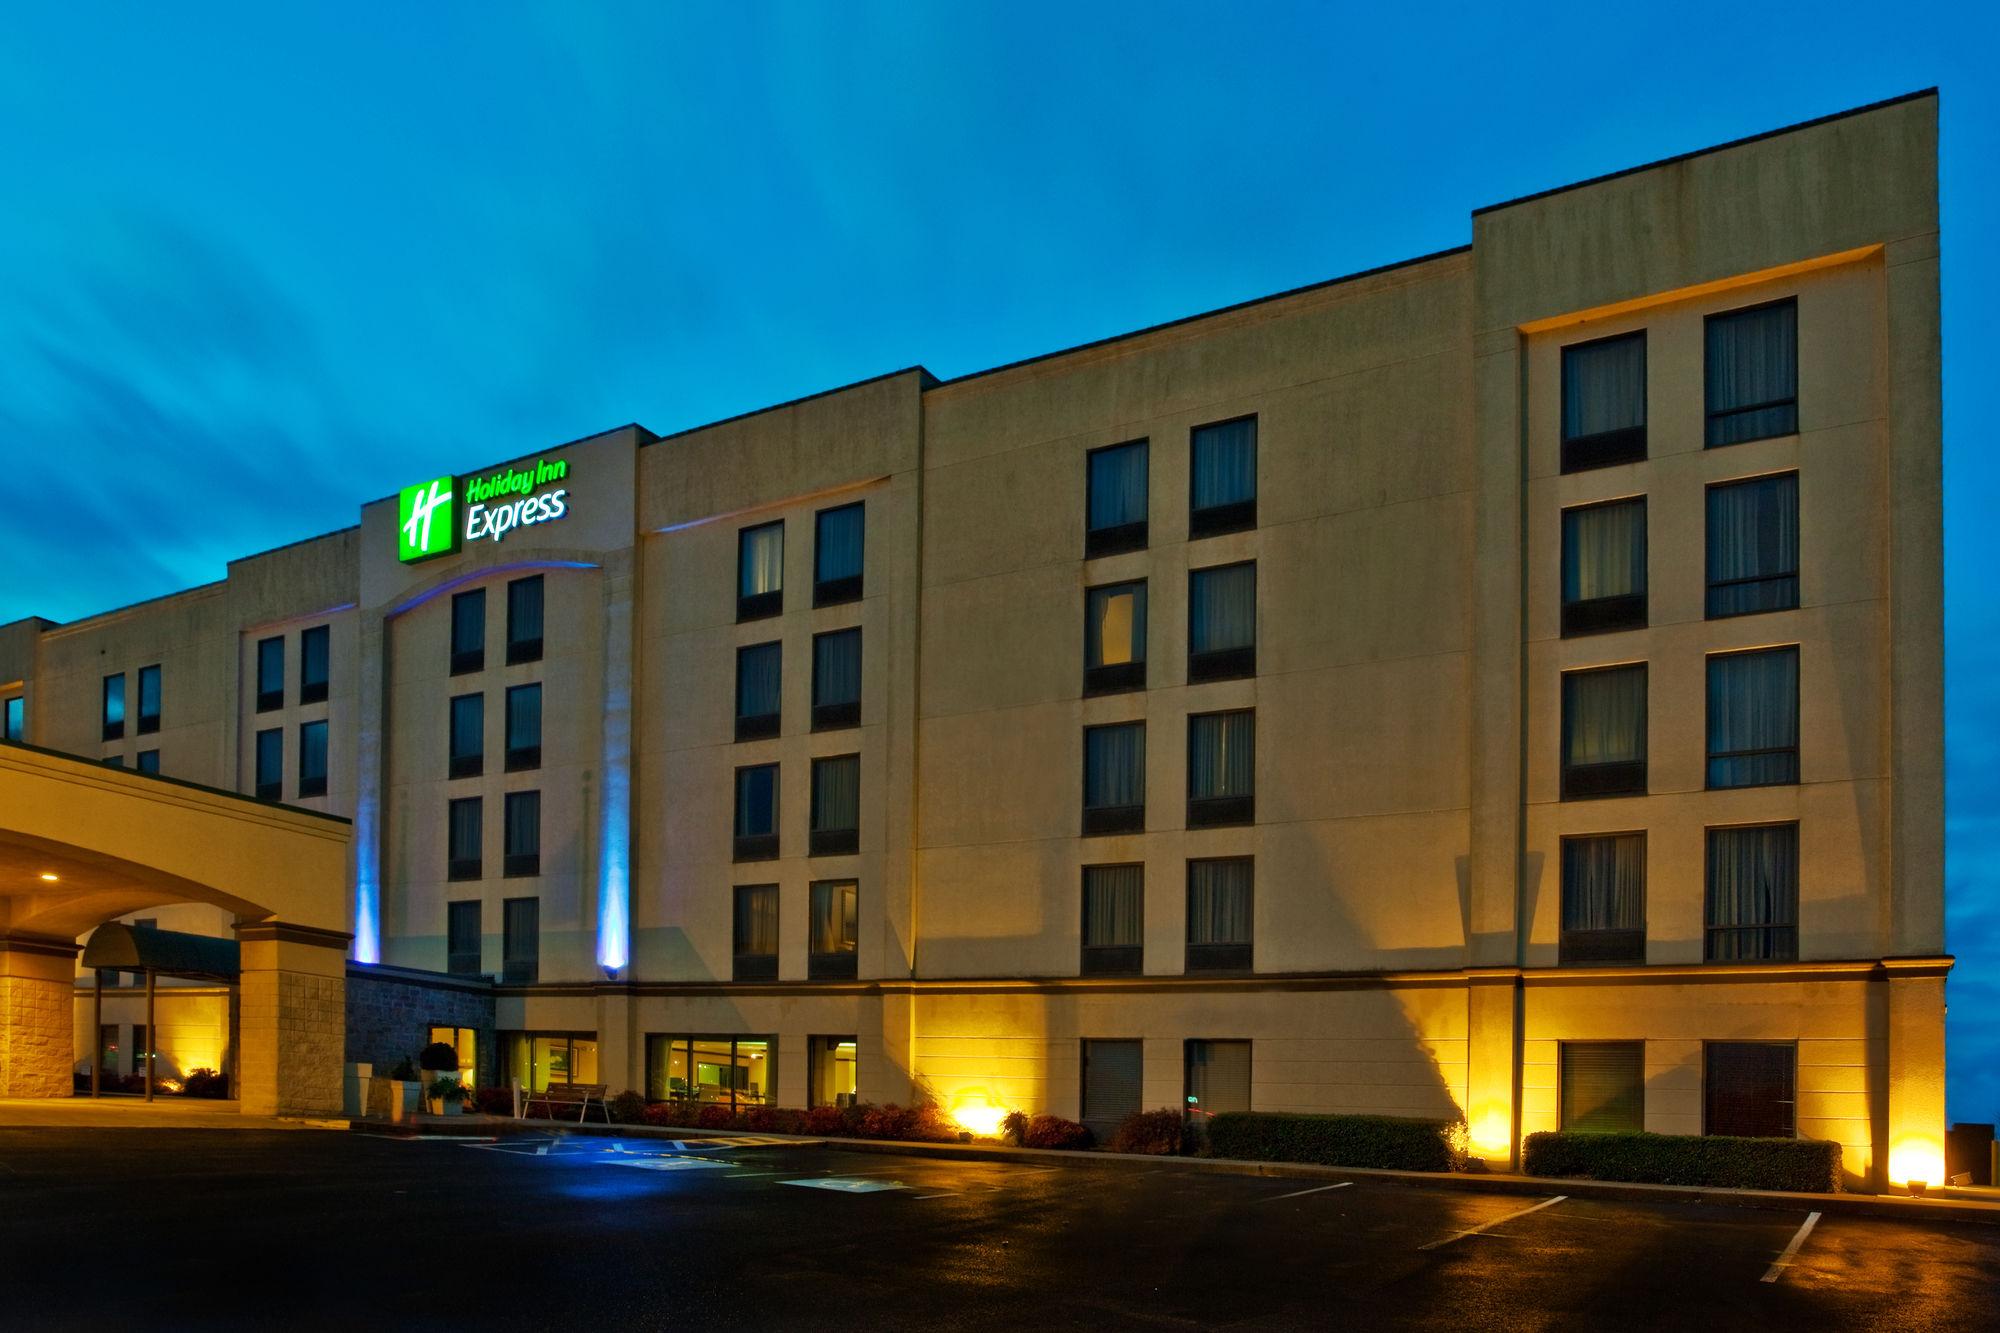 Holiday Inn Express Atlanta W/ I-20/ Douglasville in Douglasville, GA